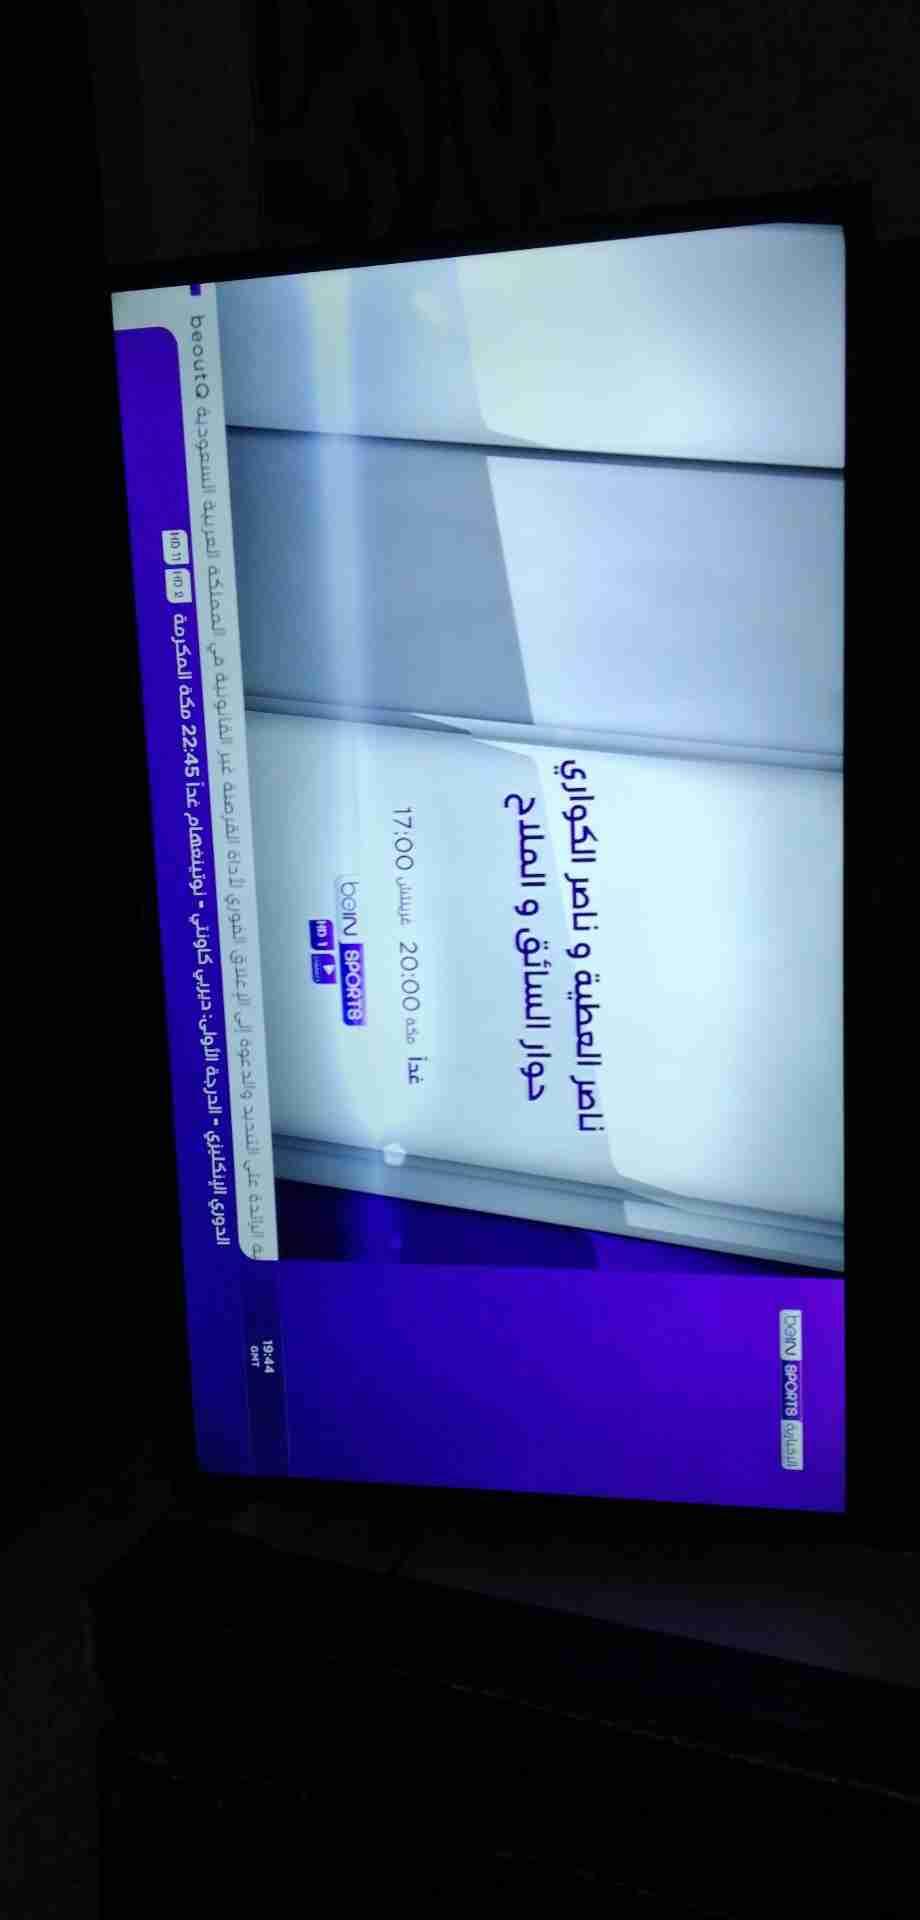 Tv for sale-  55 انش بوصه لا تنسَ أنك...